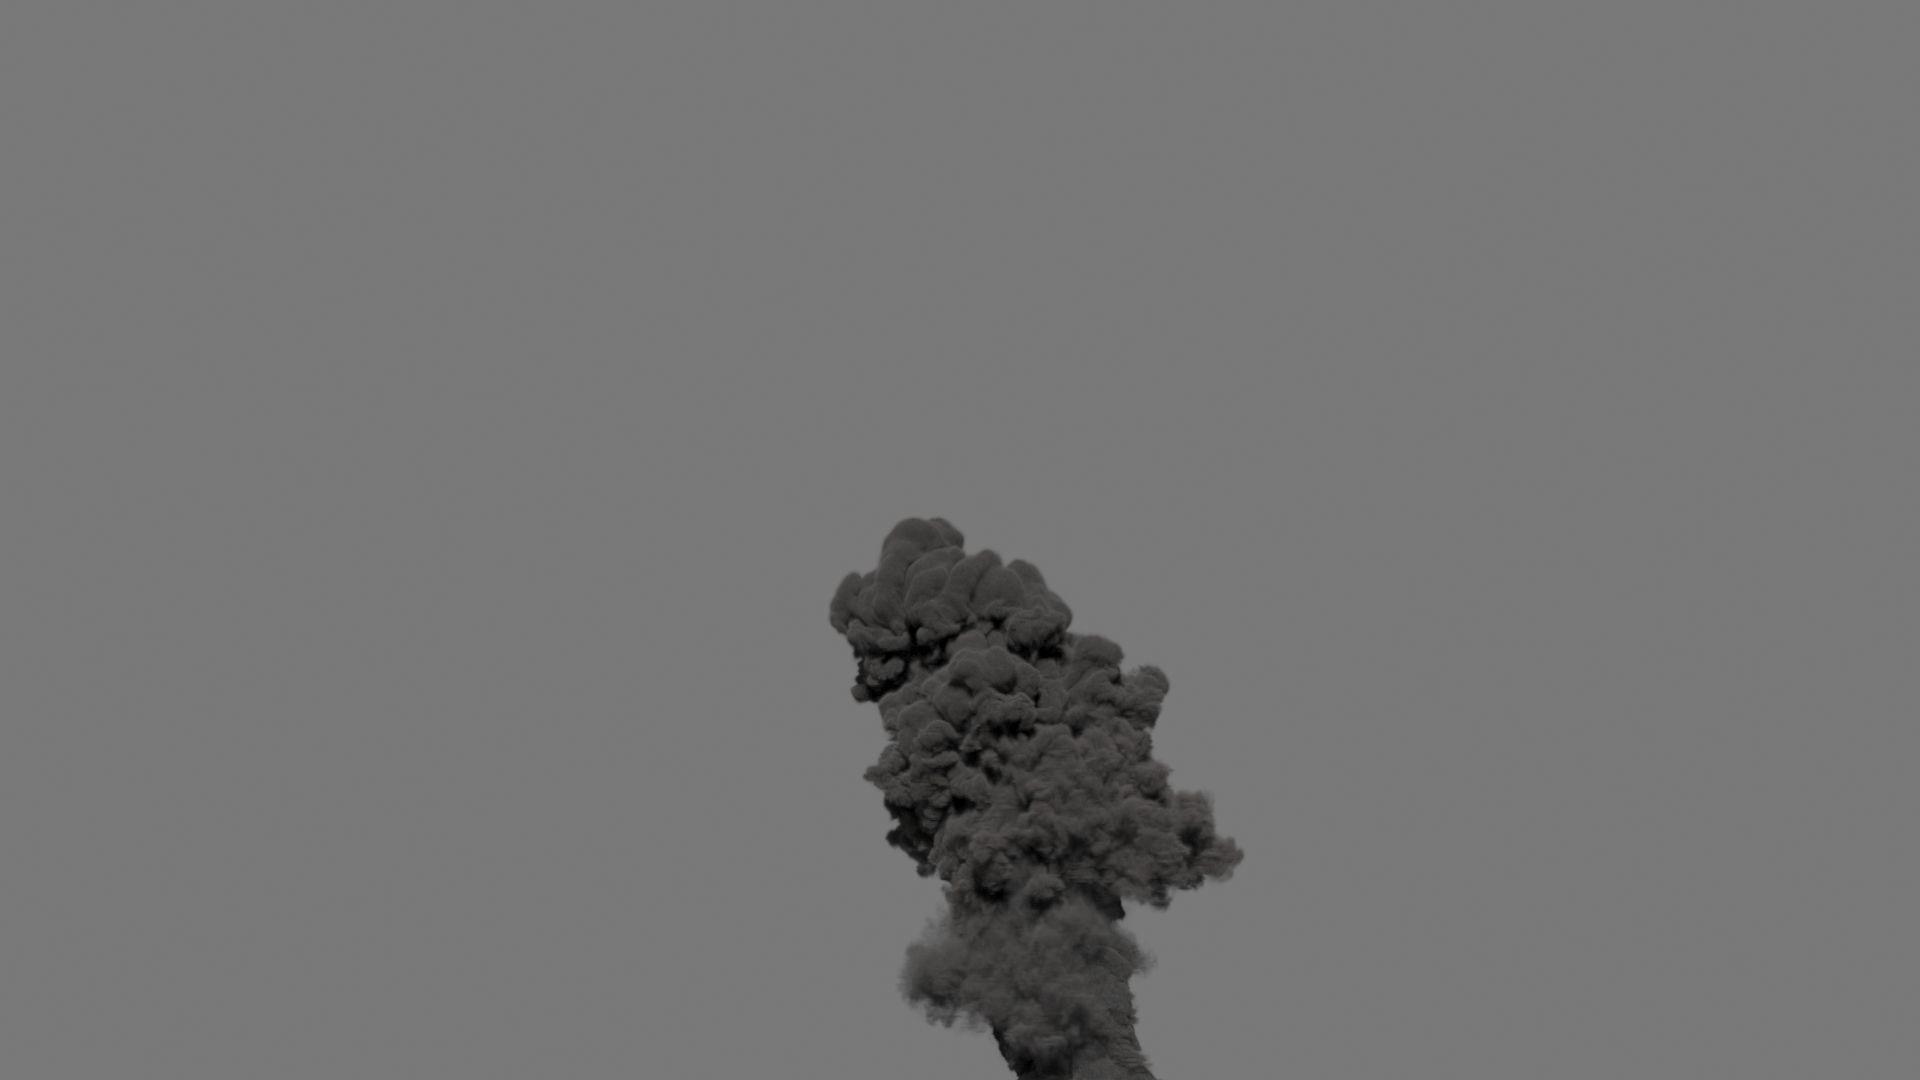 Smoke Plume 01 - VDB - LargeScale